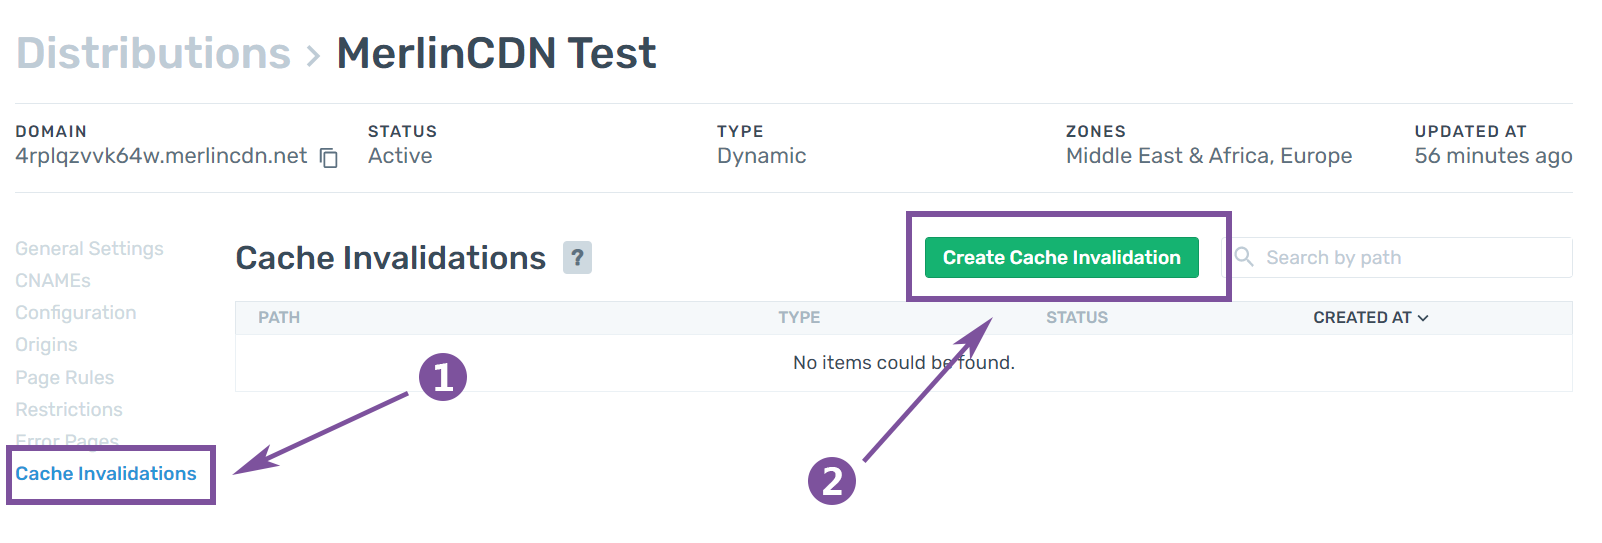 cdn-cache-invalidation